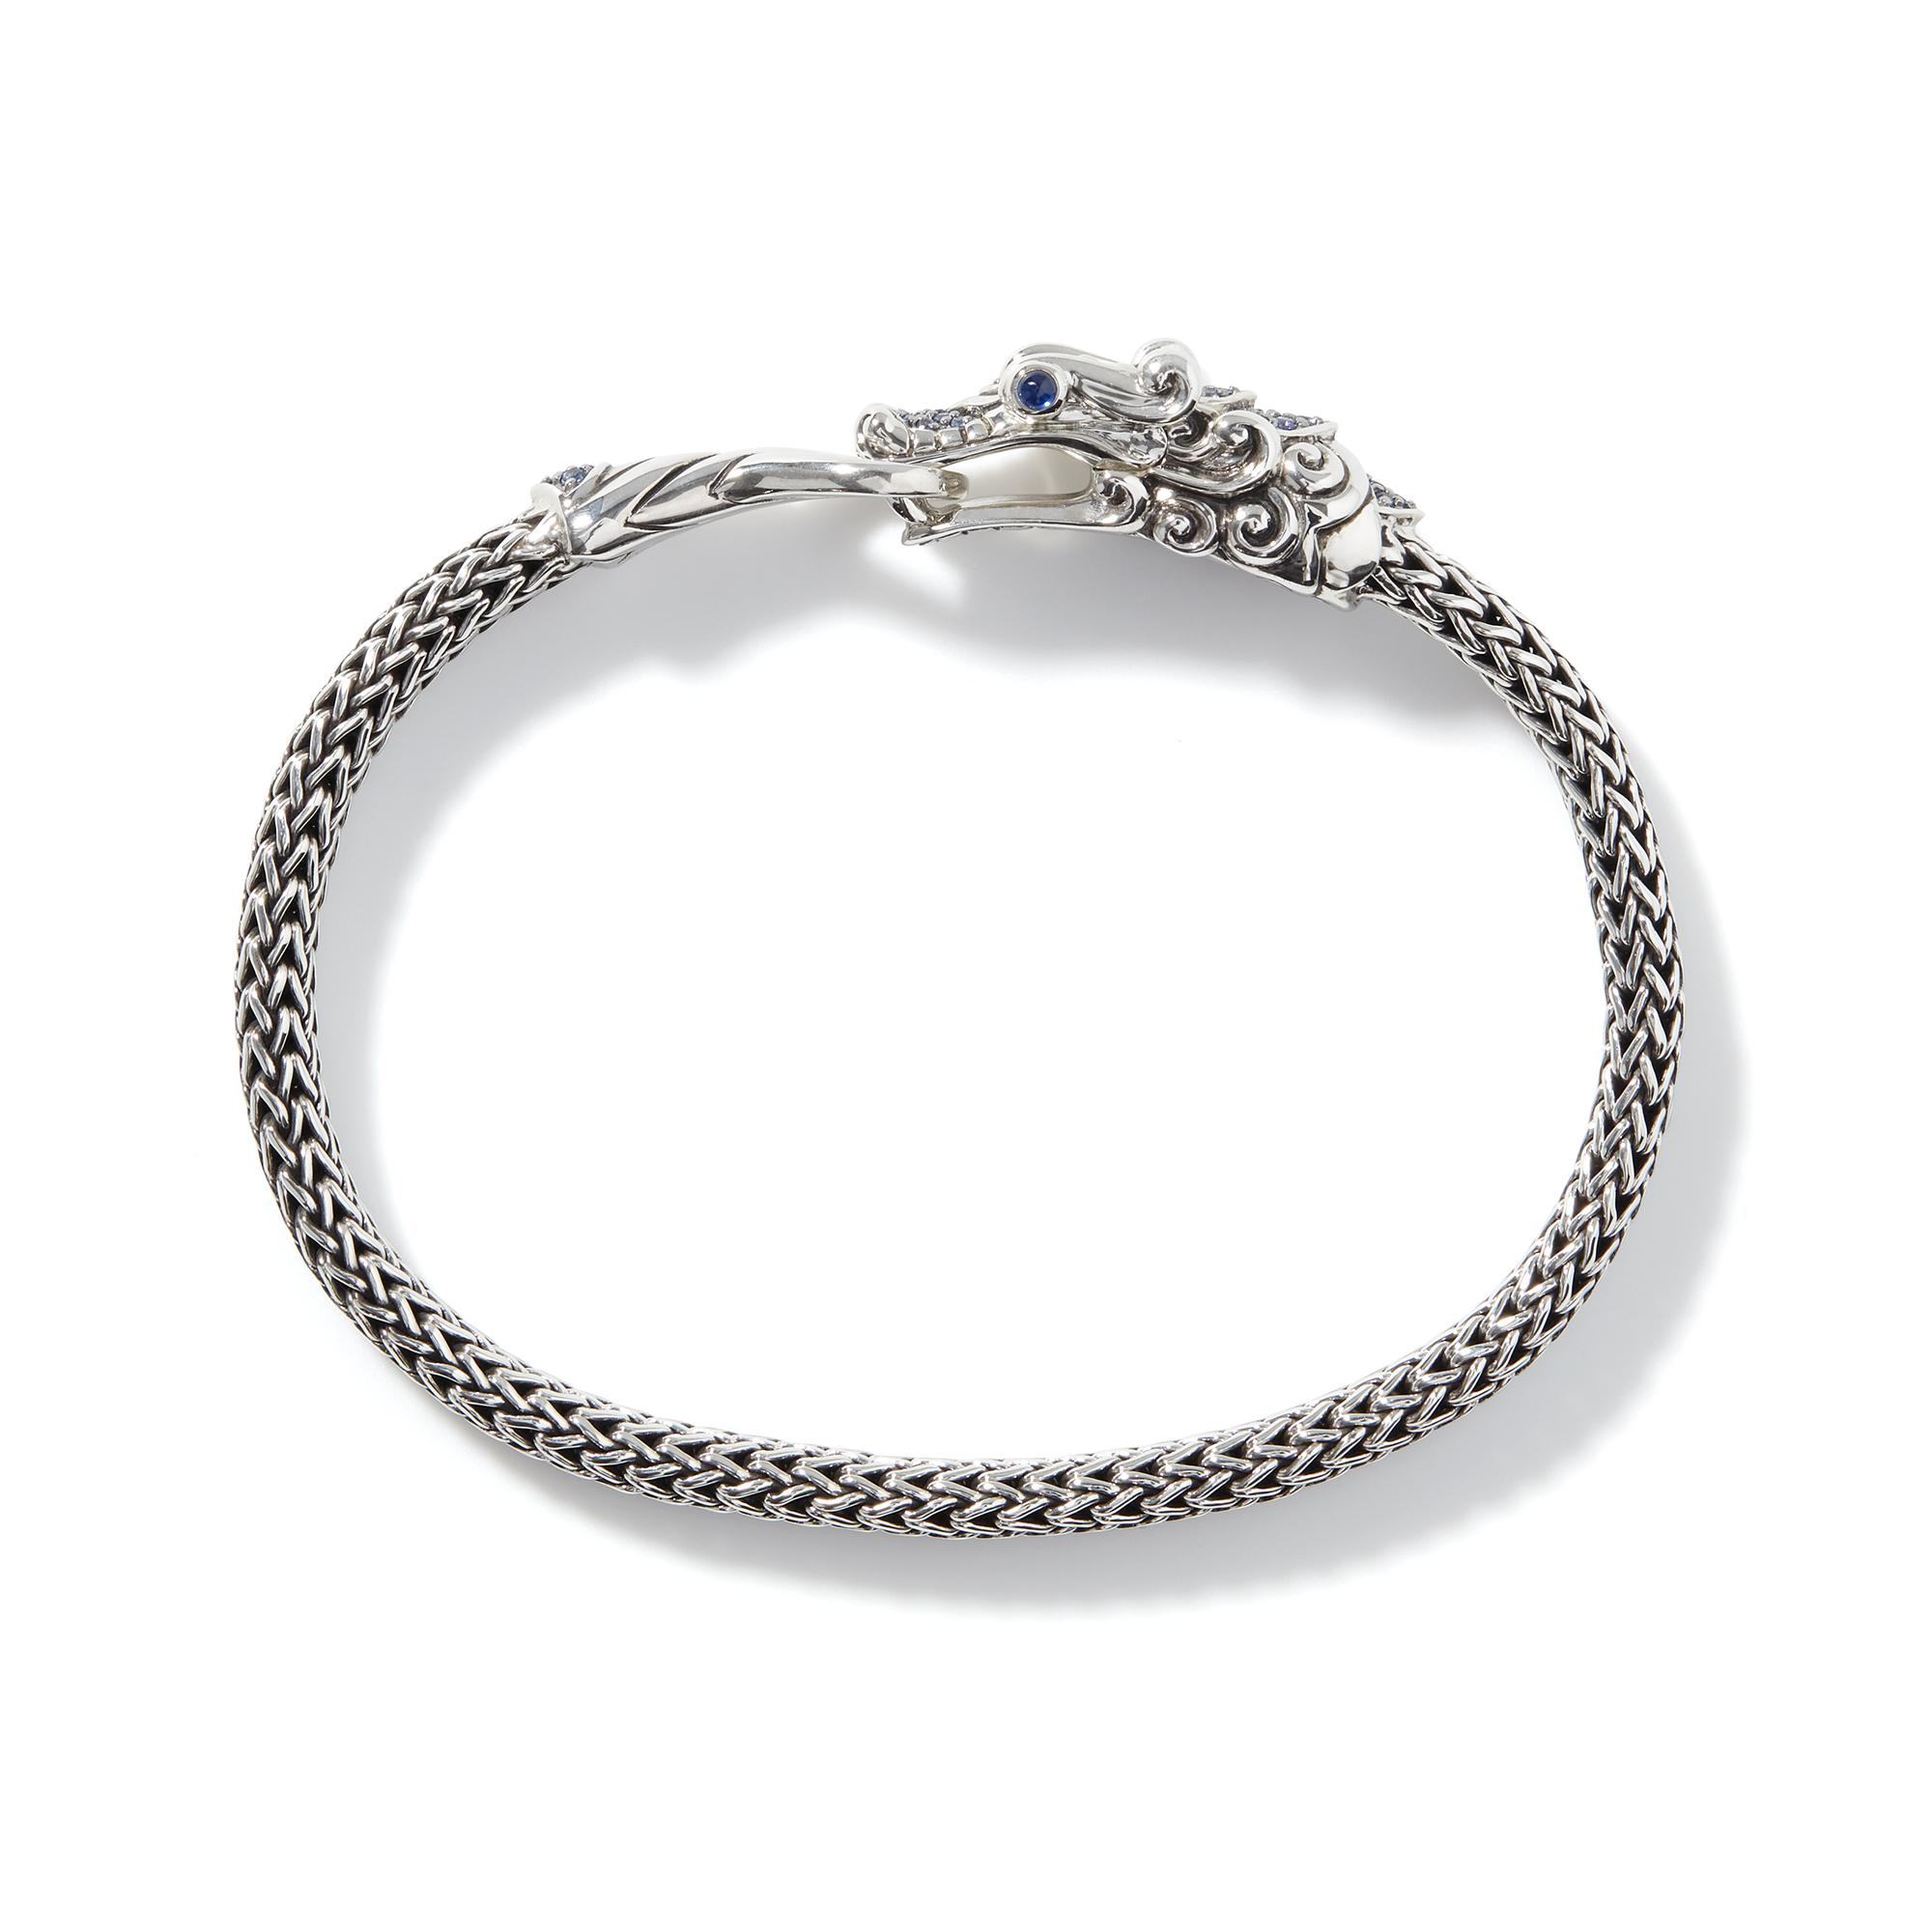 Legends Naga 5MM Station Bracelet in Silver with Gemstone, Blue Sapphire, large